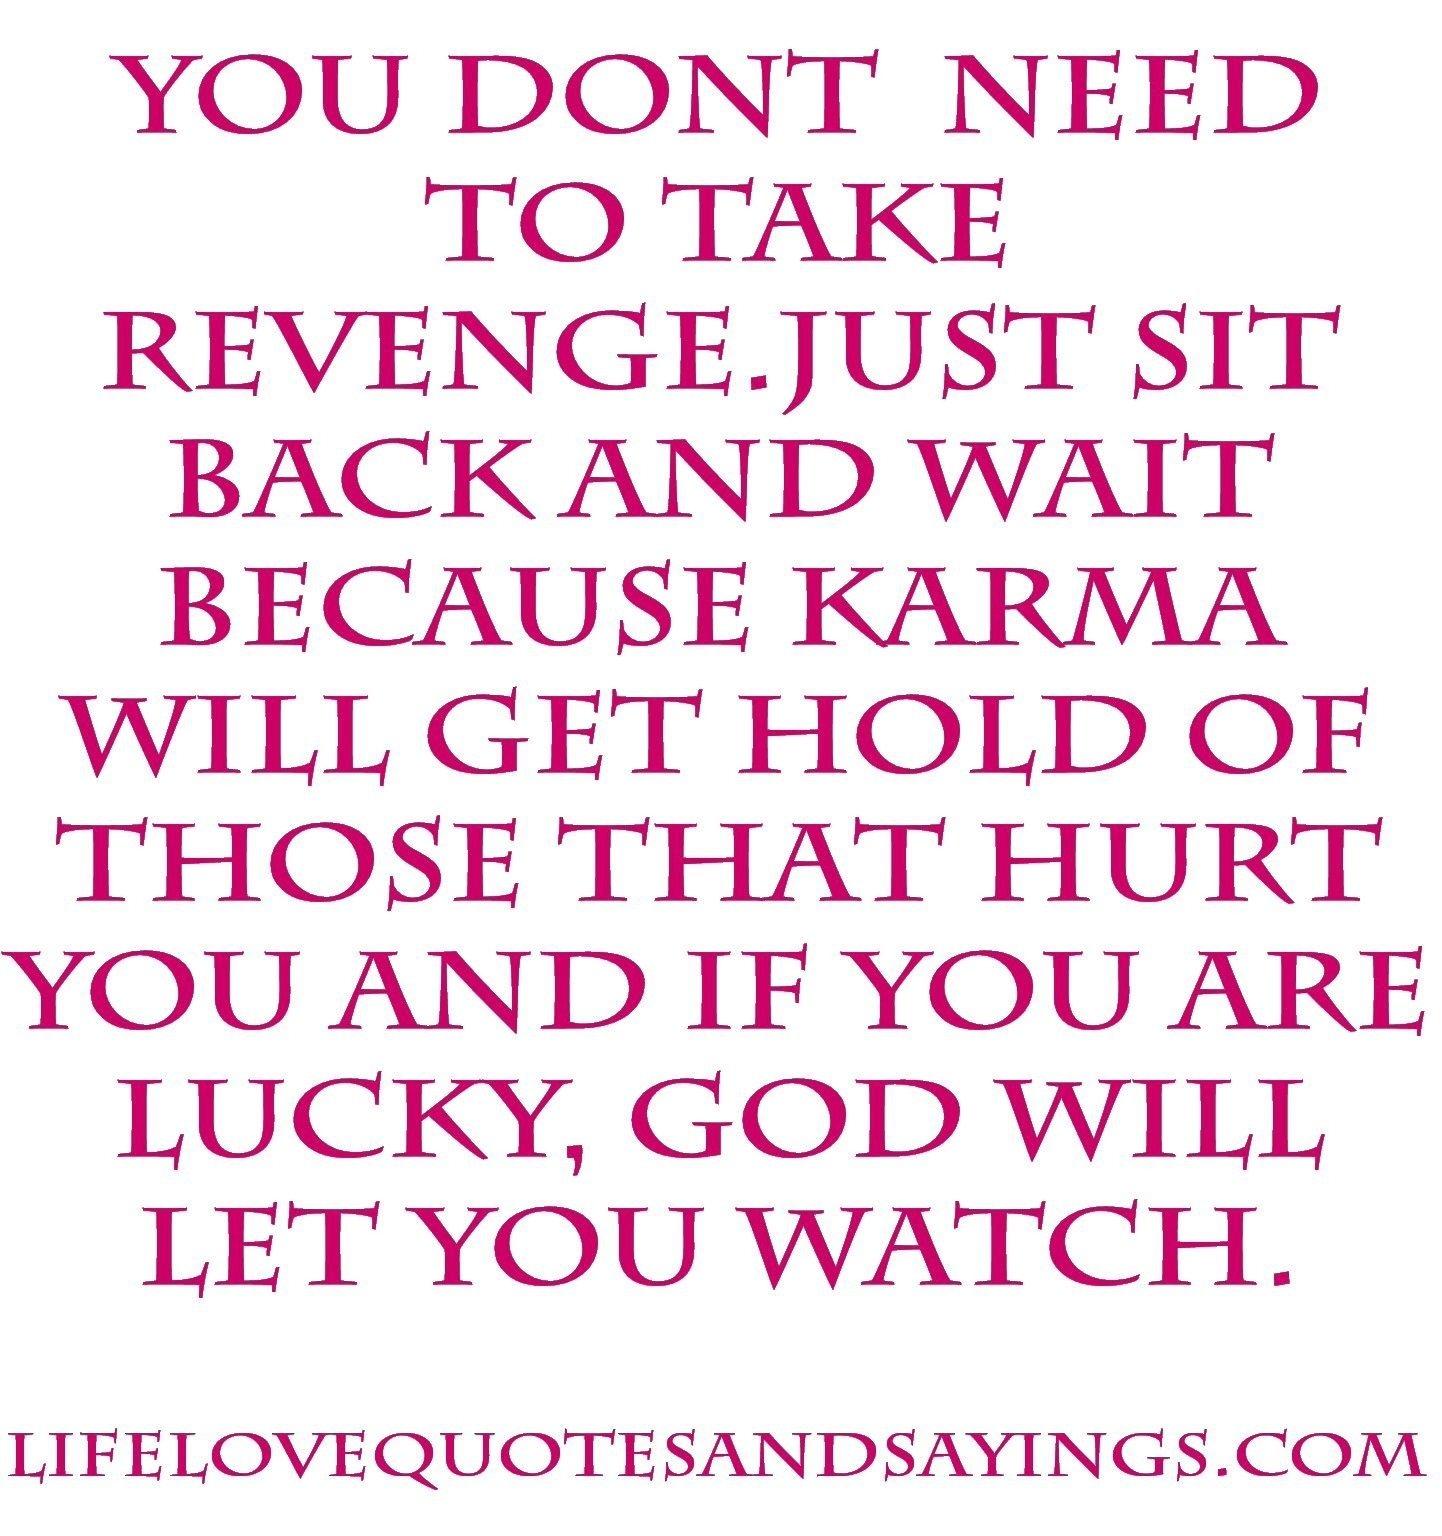 10 Pretty Revenge Ideas On Backstabbing Friends karma snarky betrayal quotes karma pinterest betrayal quotes 2020